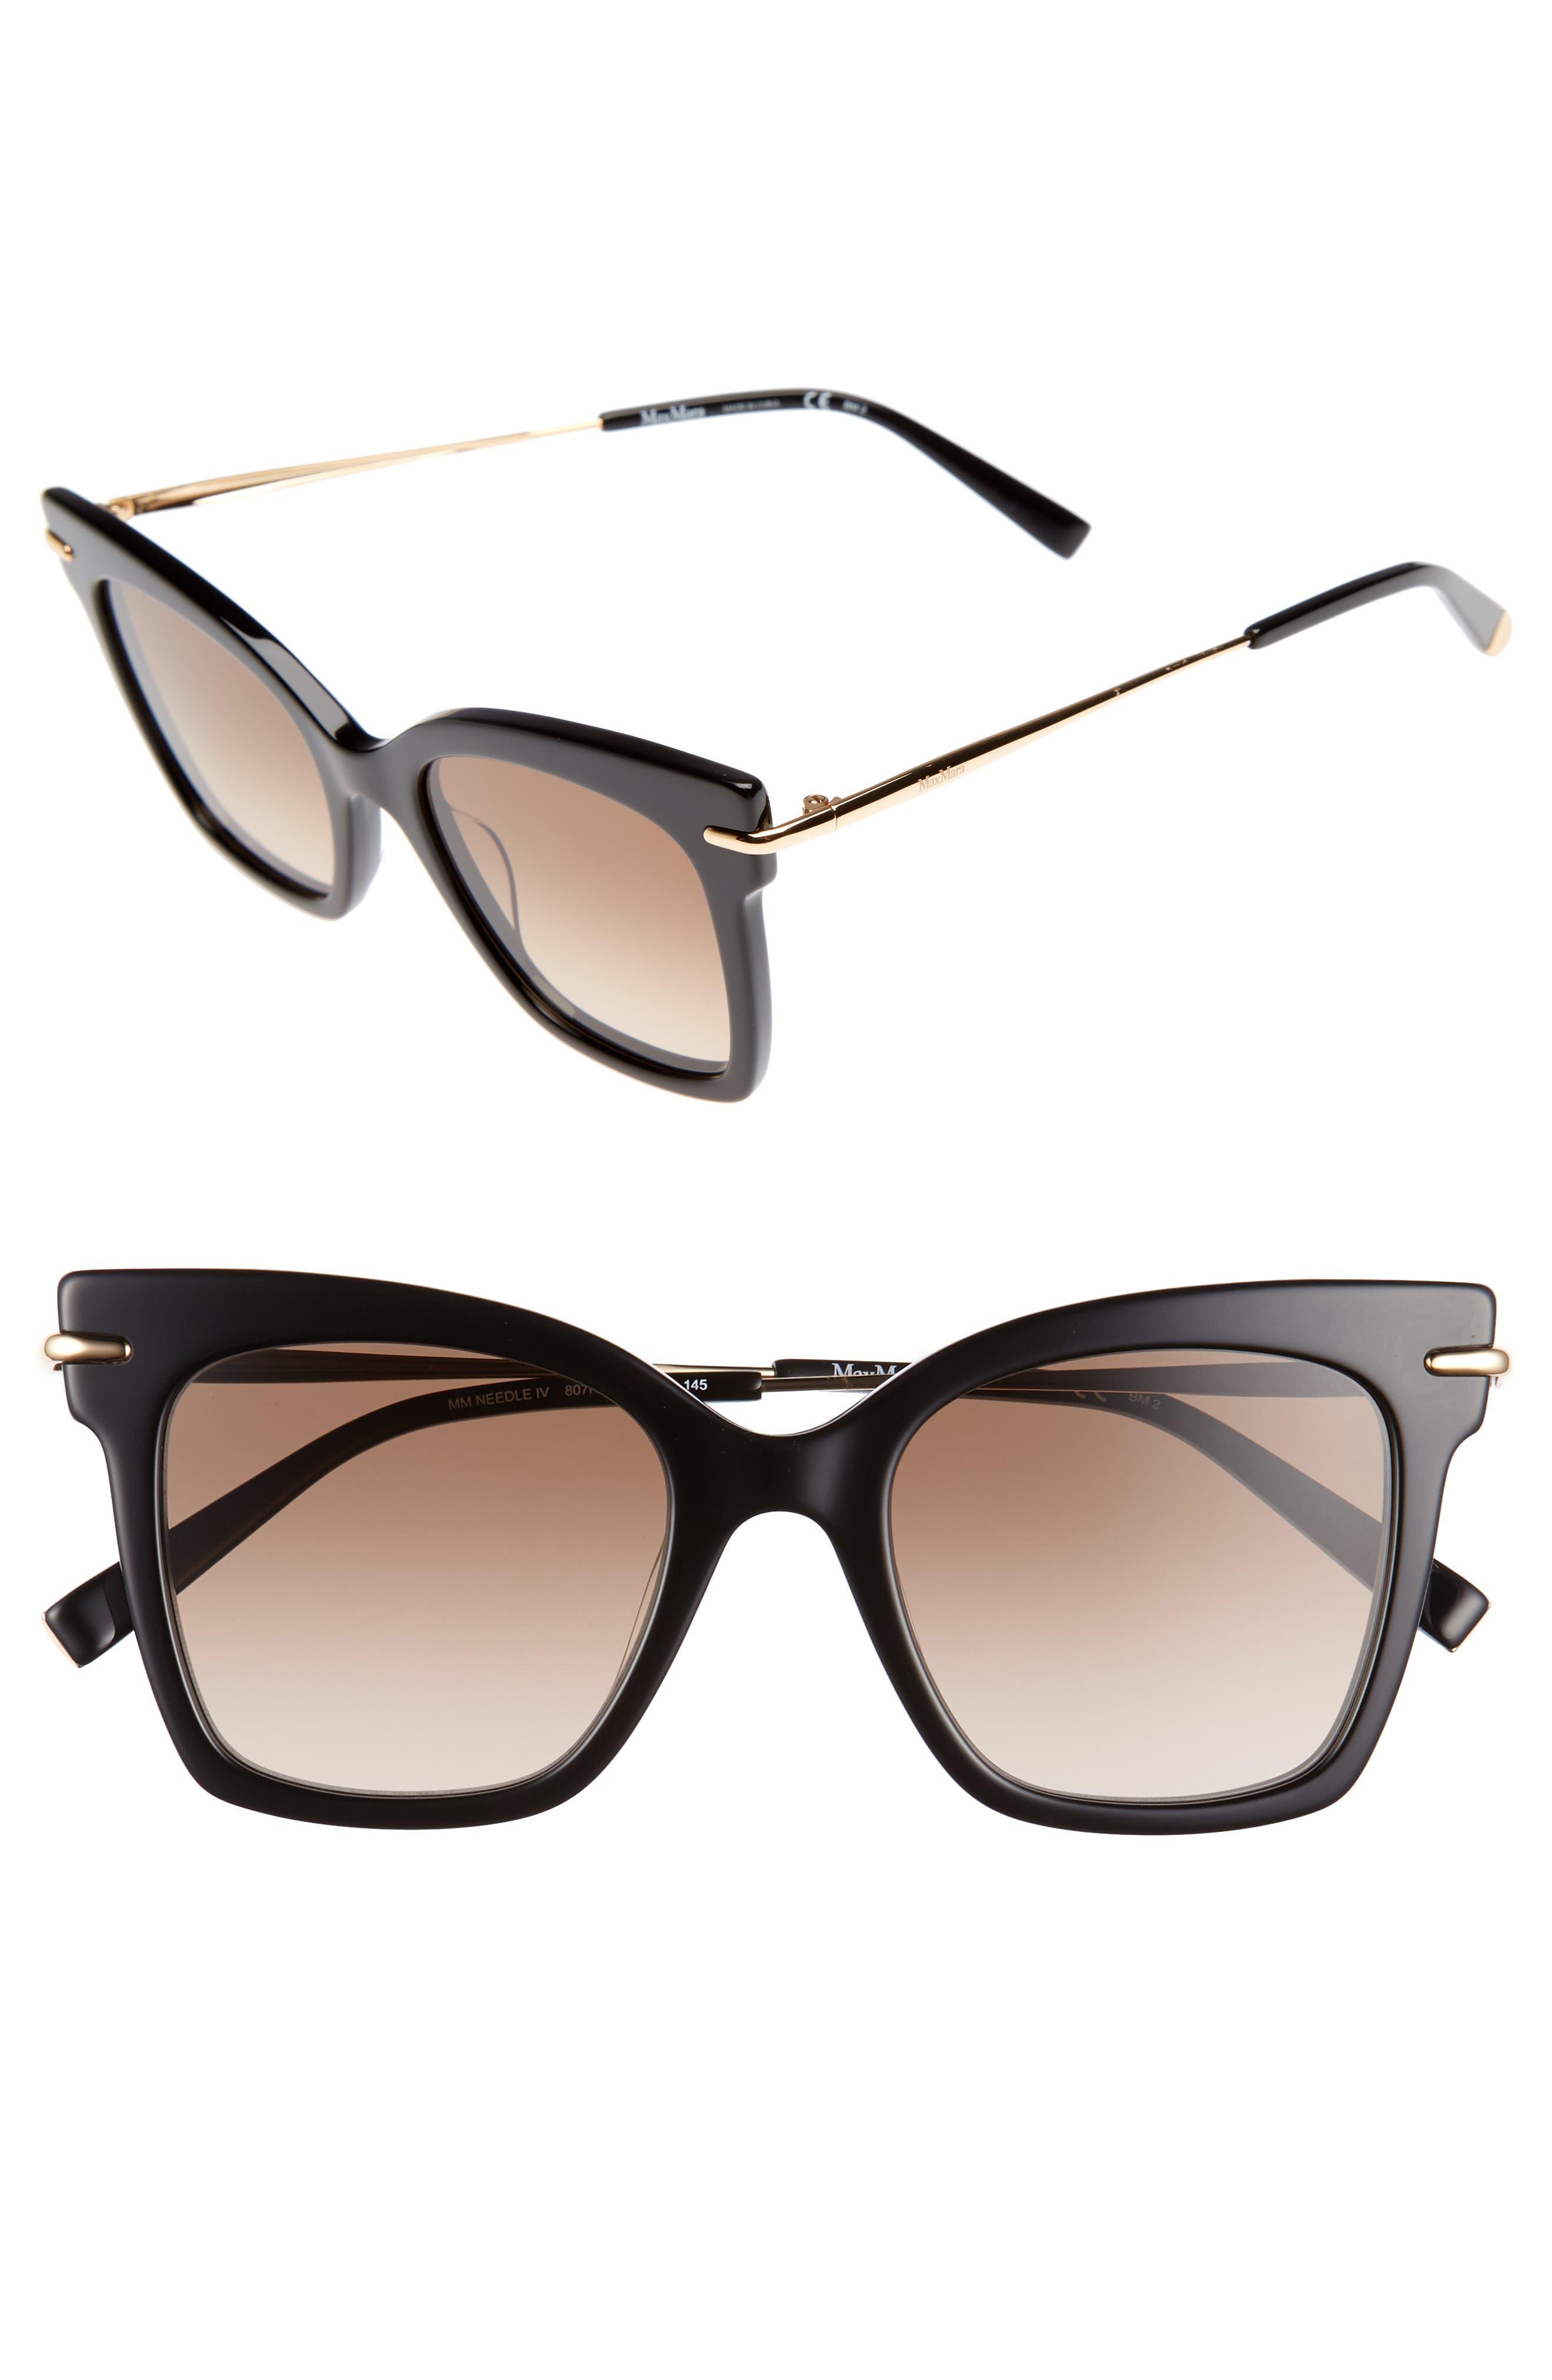 Main Image - Max Mara Needliv 49mm Gradient Cat Eye Sunglasses